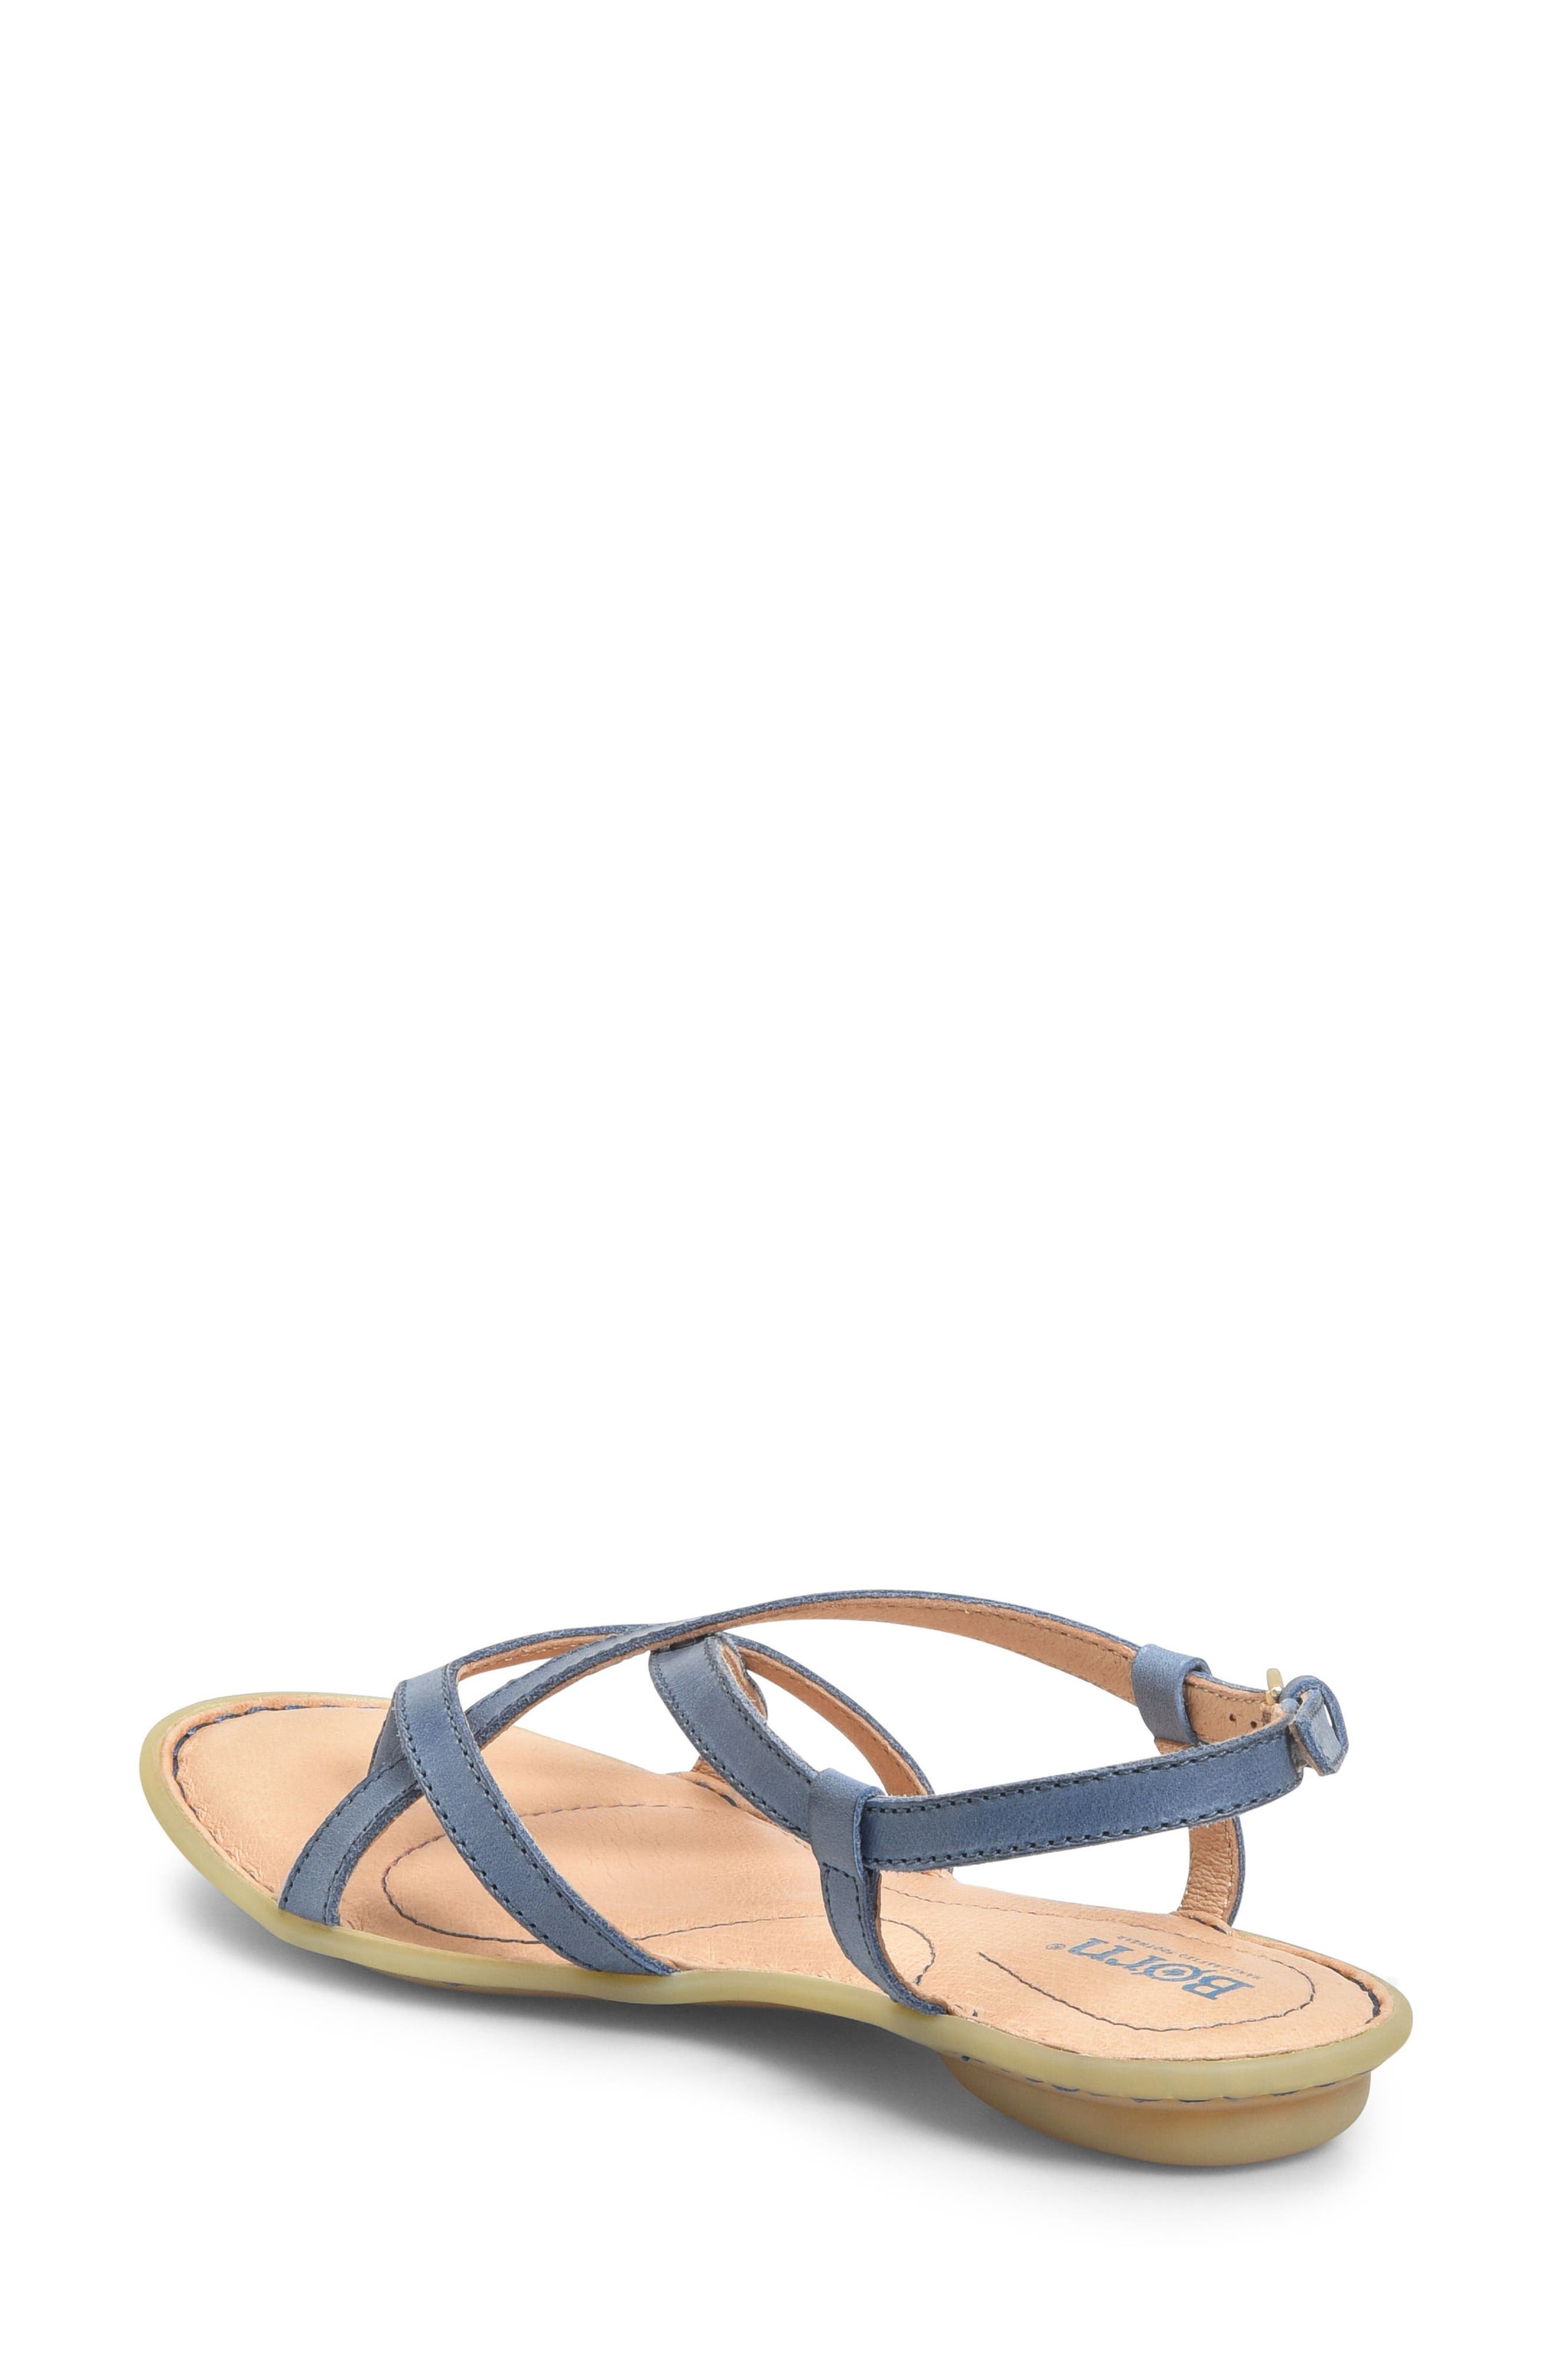 Mai Strap Sandal,                             Alternate thumbnail 2, color,                             Navy Leather